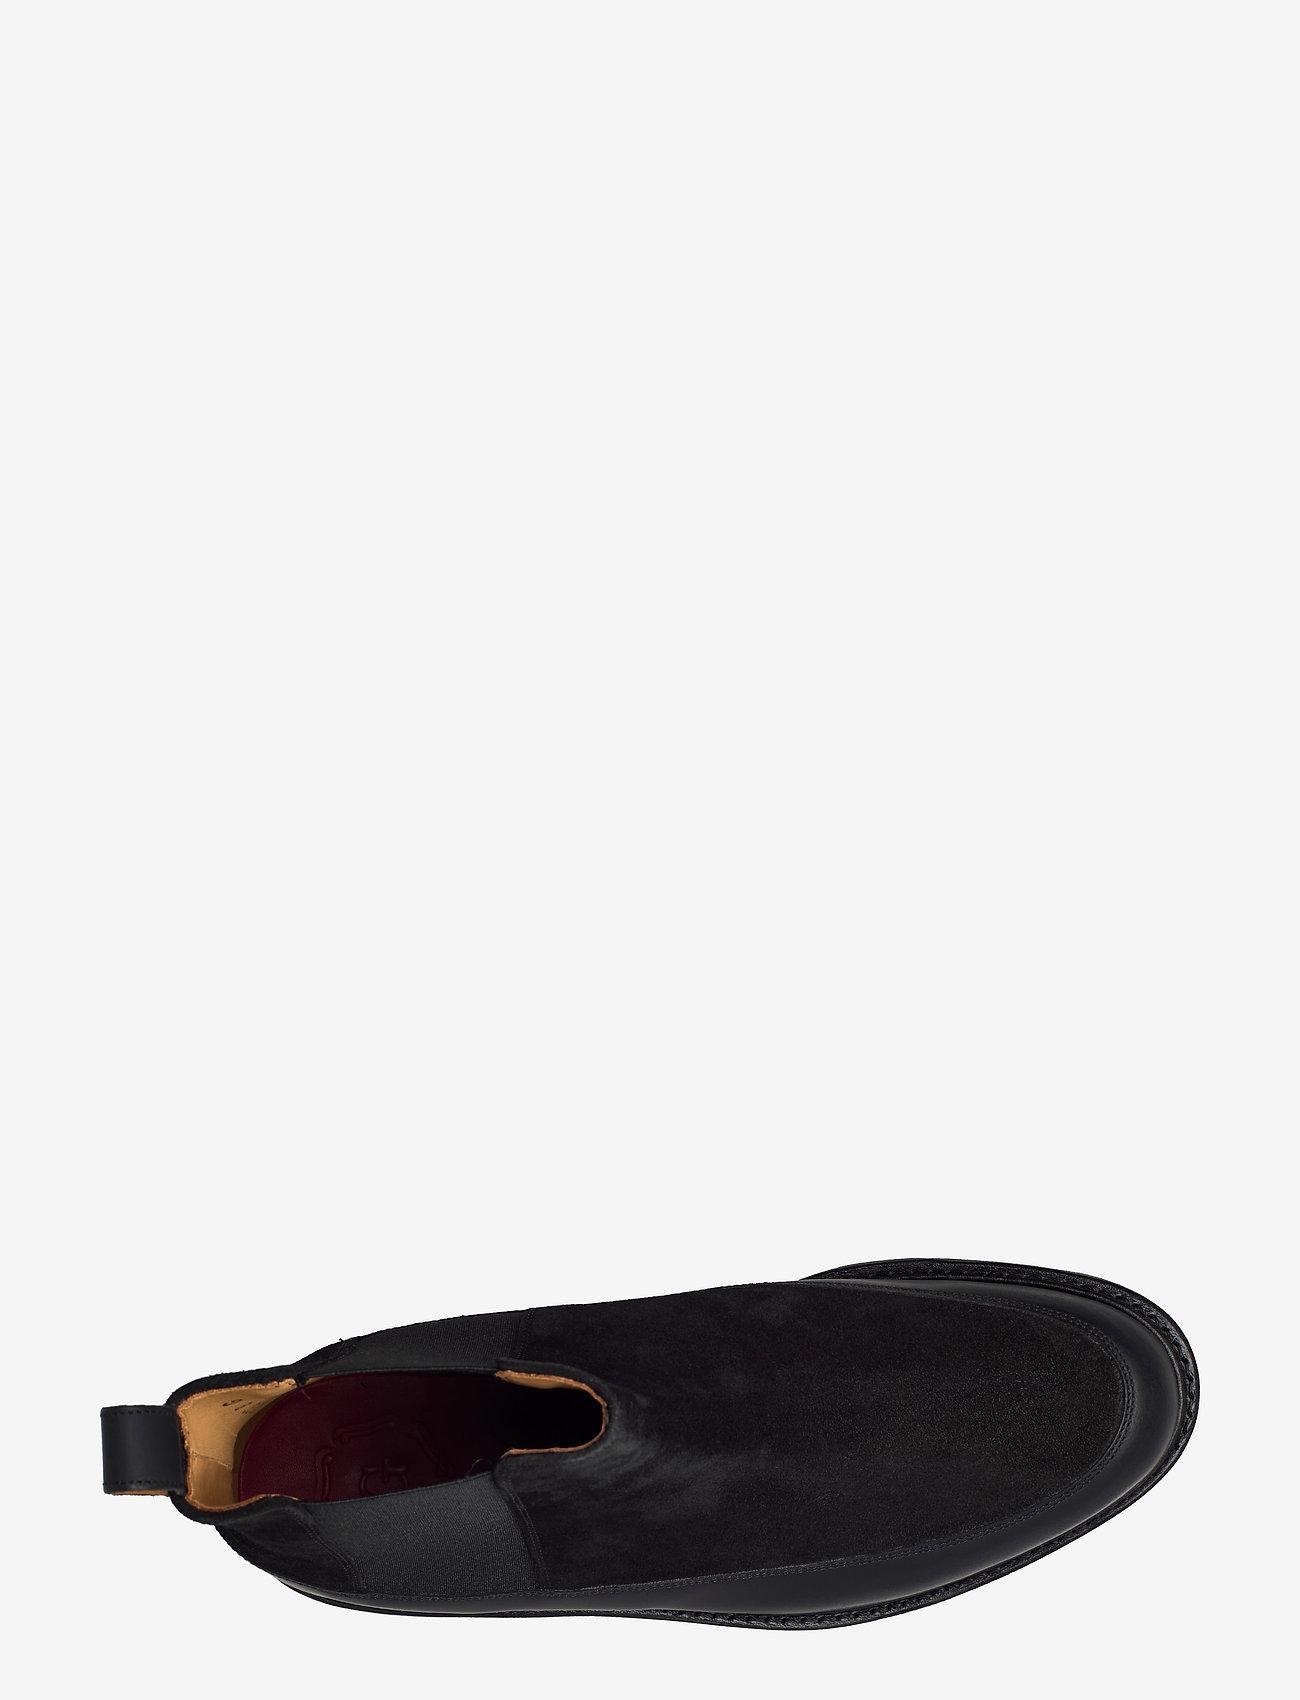 Grenson - ABNER - kängor - black suede - 3